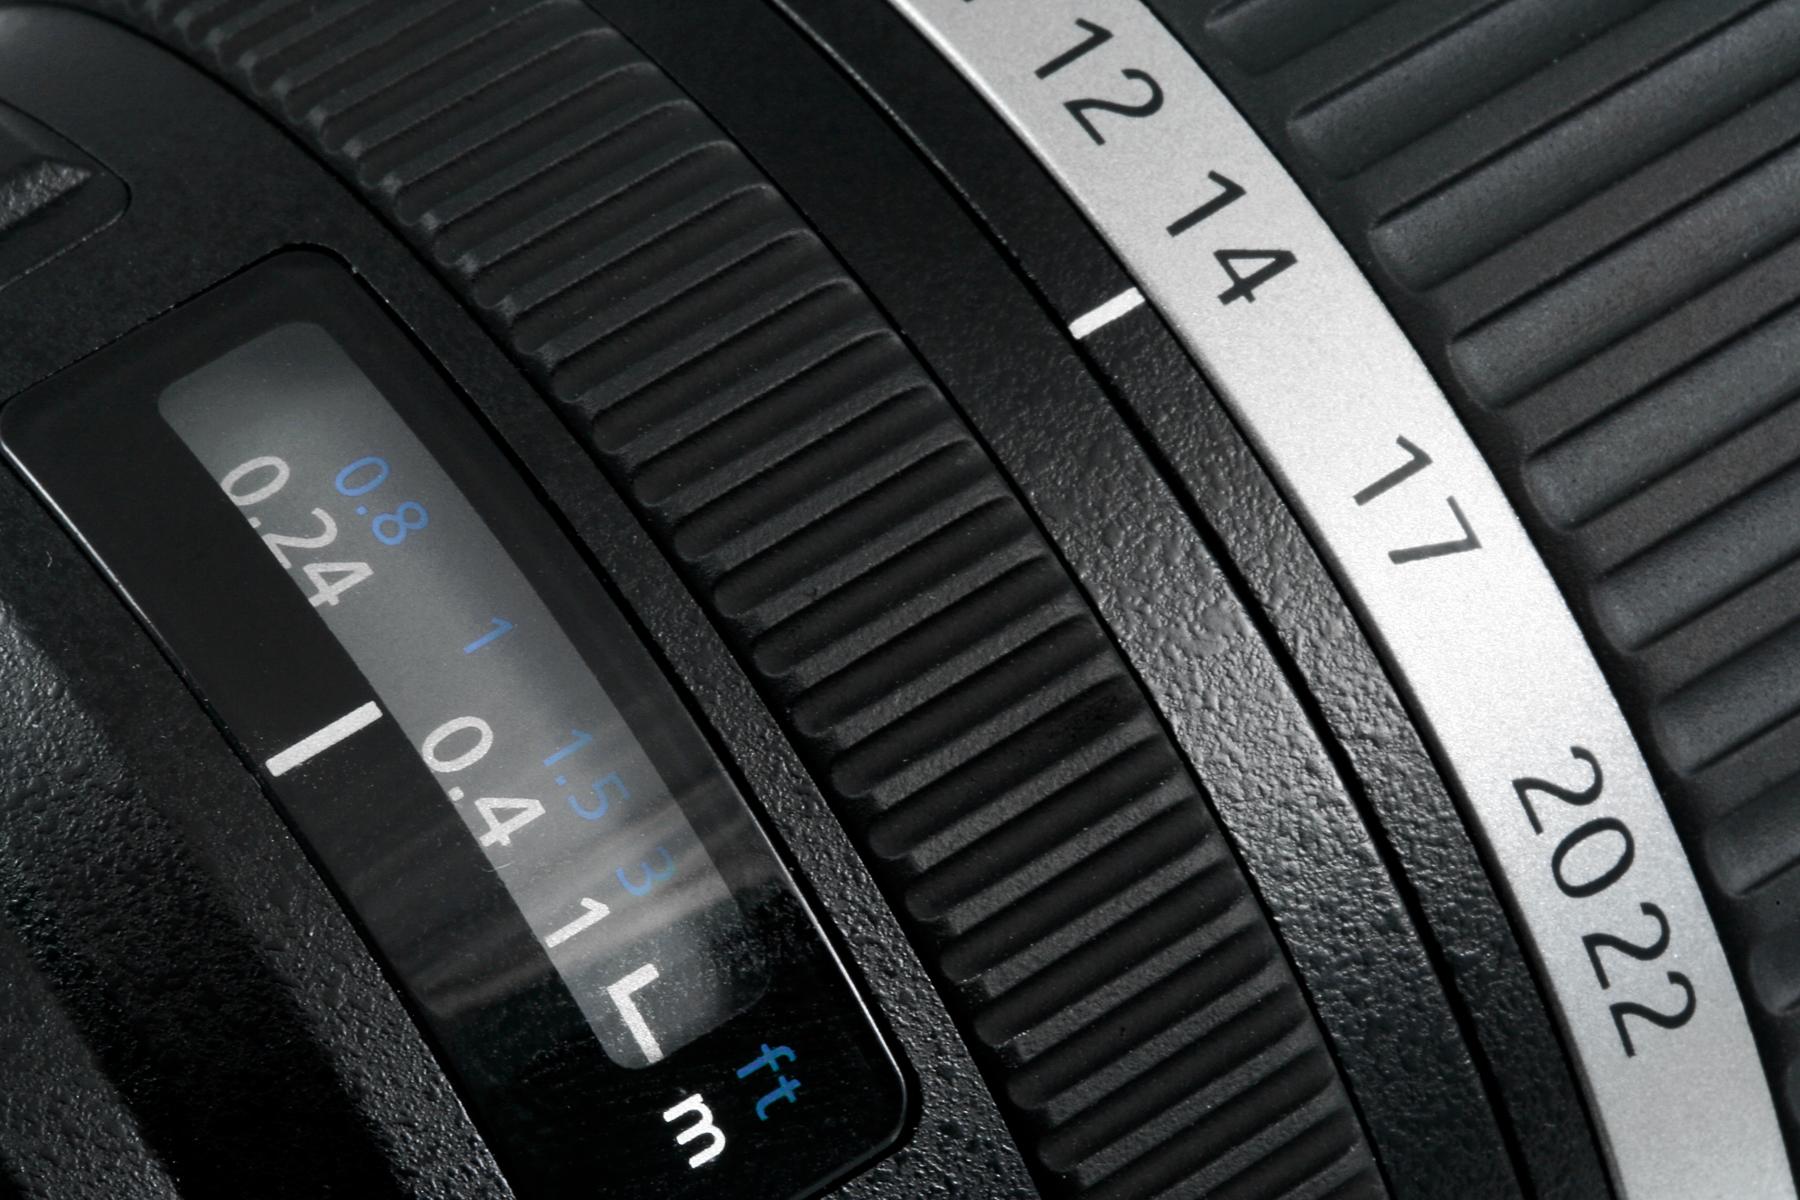 Lens Macro, 35, Photograph, Mm, Object, HQ Photo